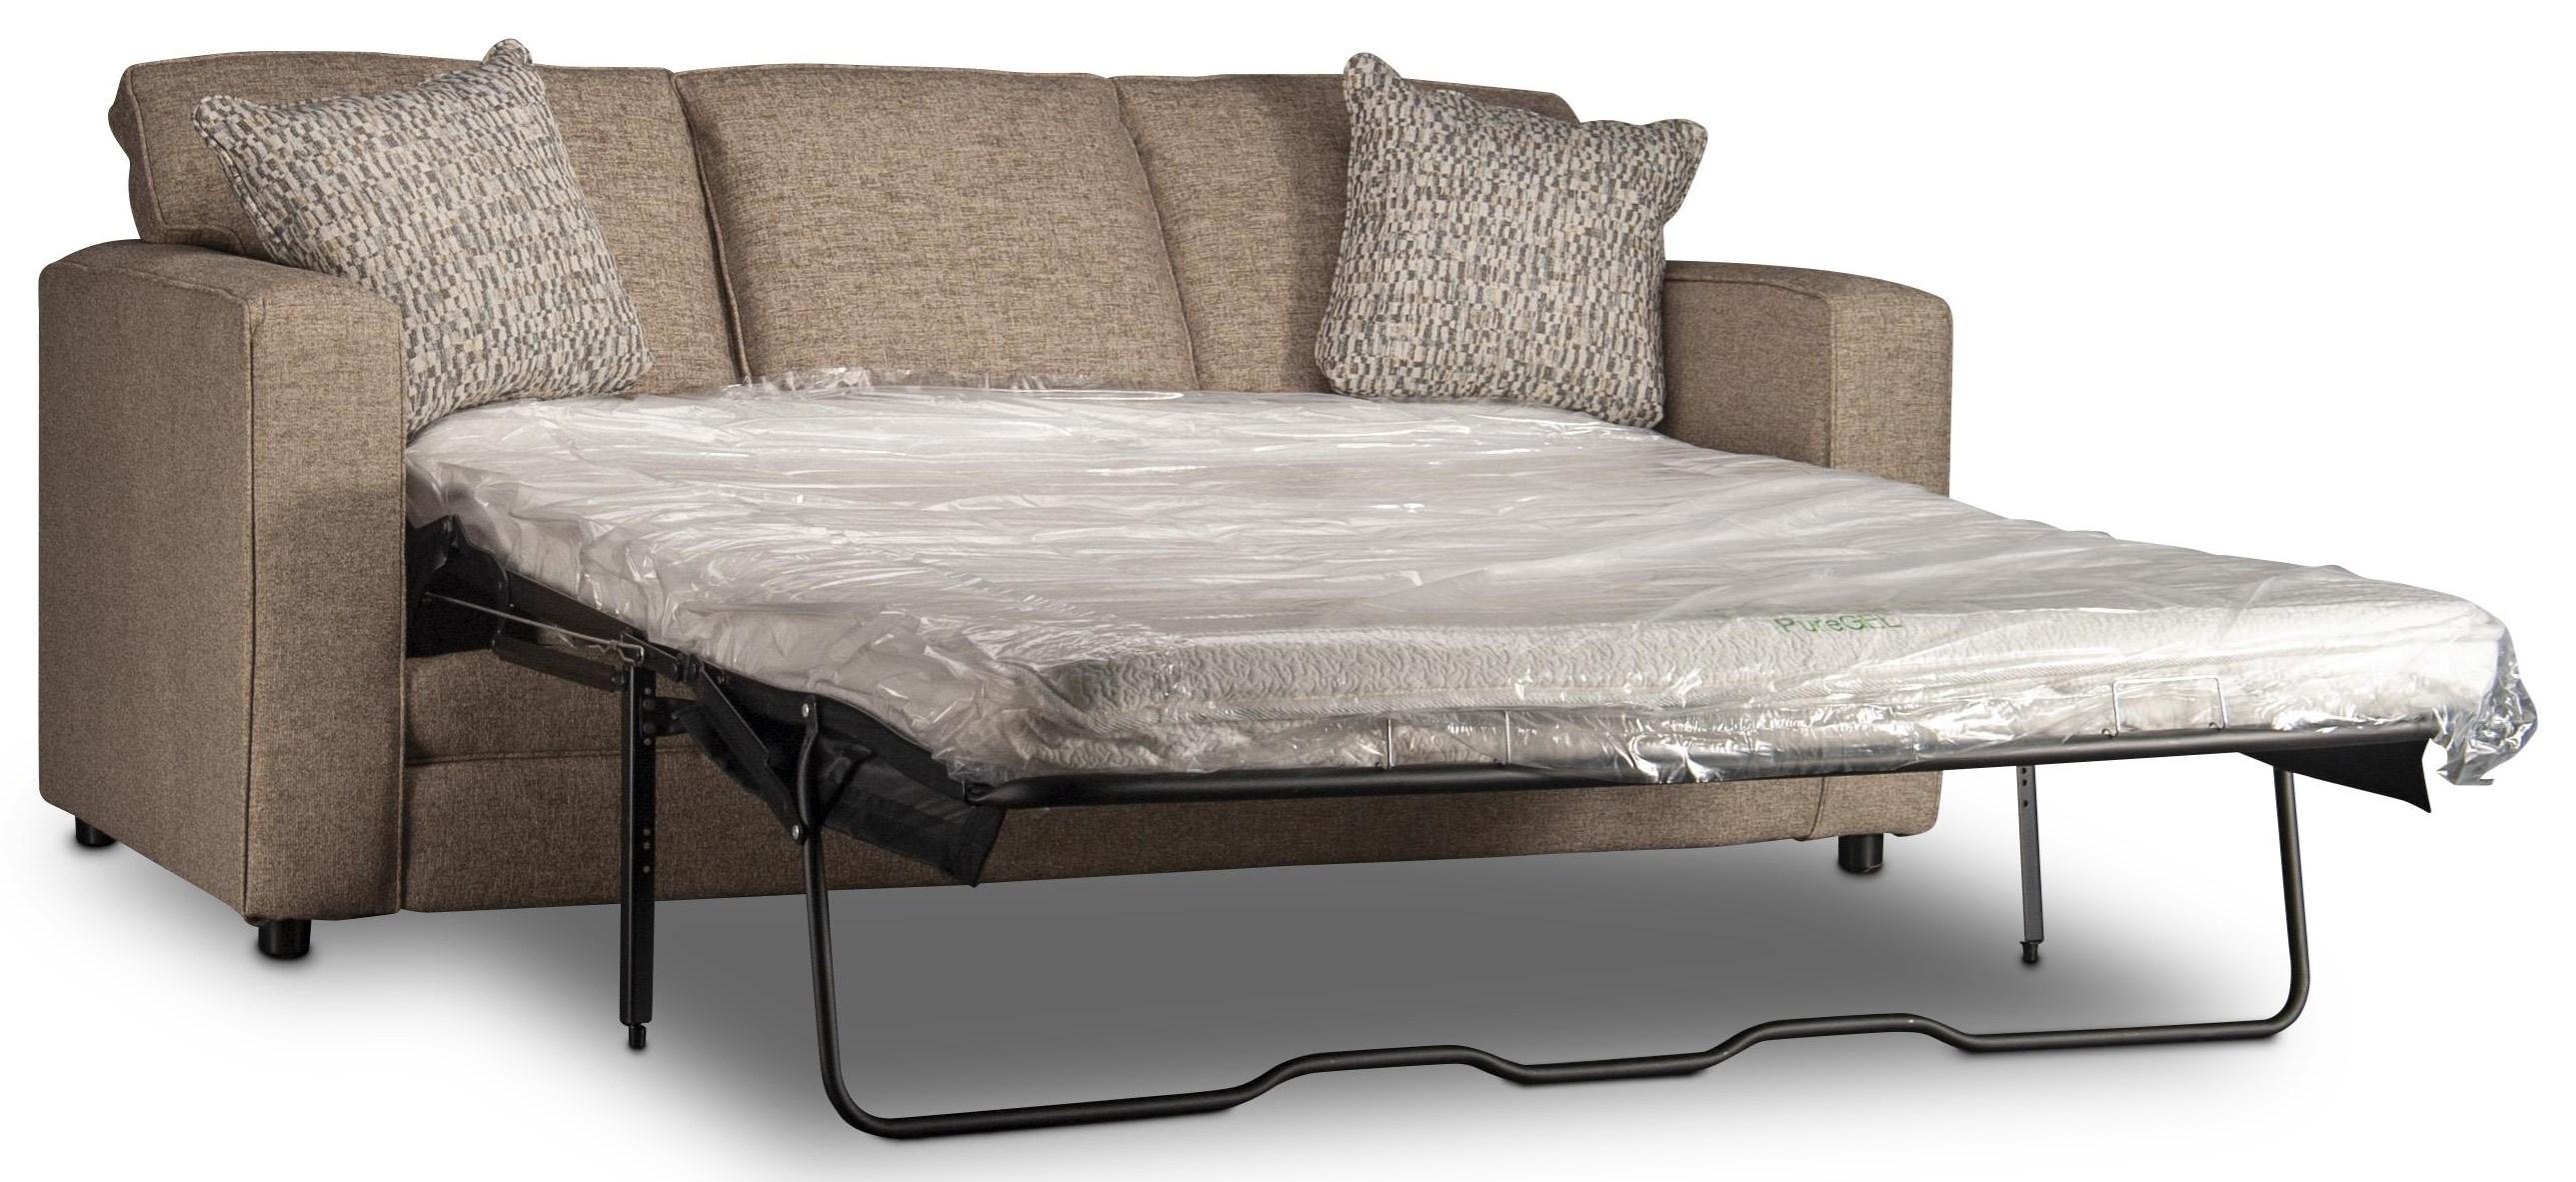 Vera Vera Queen Sleeper Sofa by Klaussner at Morris Home